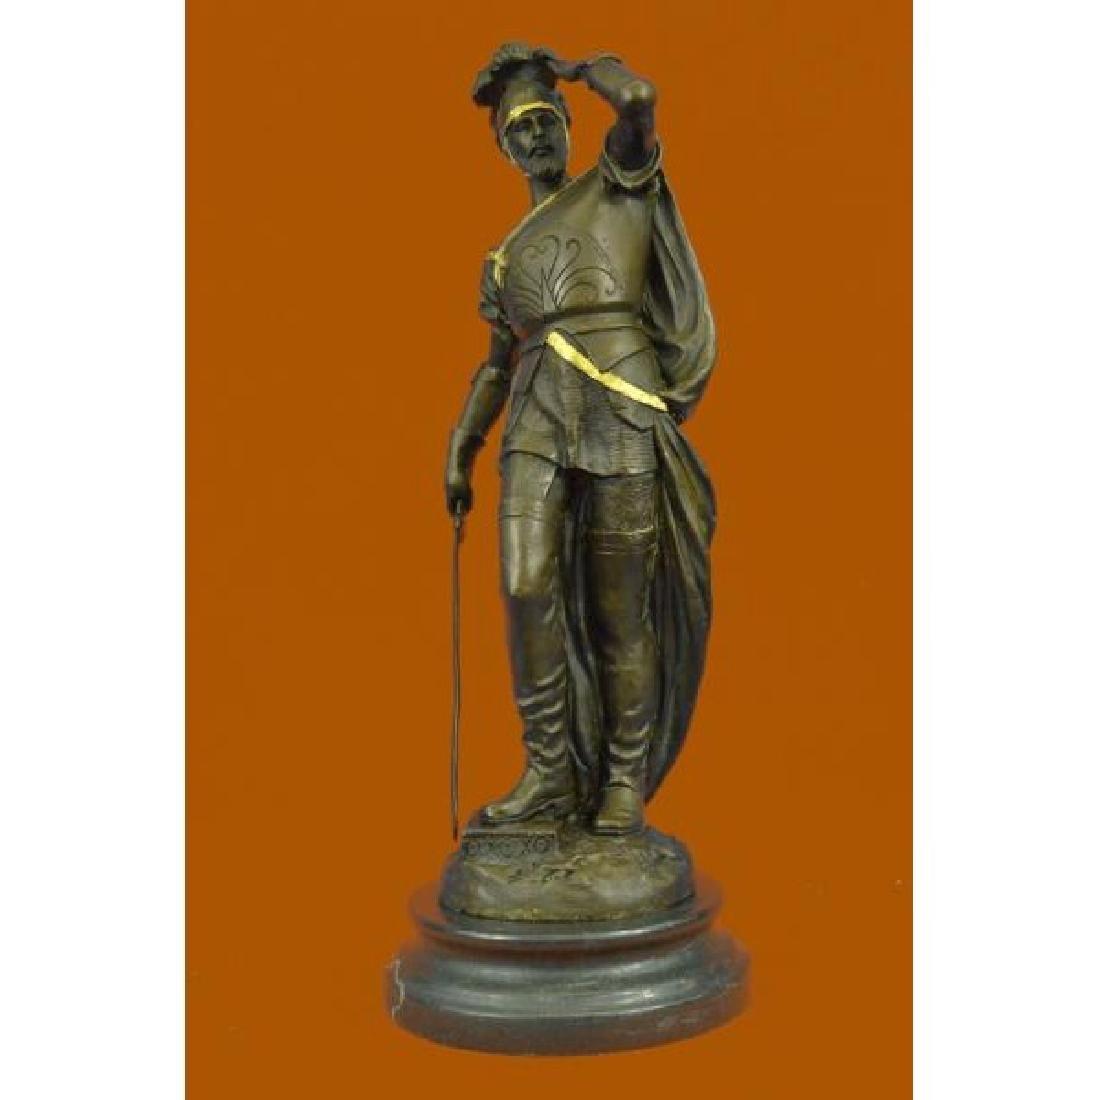 Pizarro Roman Legion Soldier Bronze Sculpture Marble